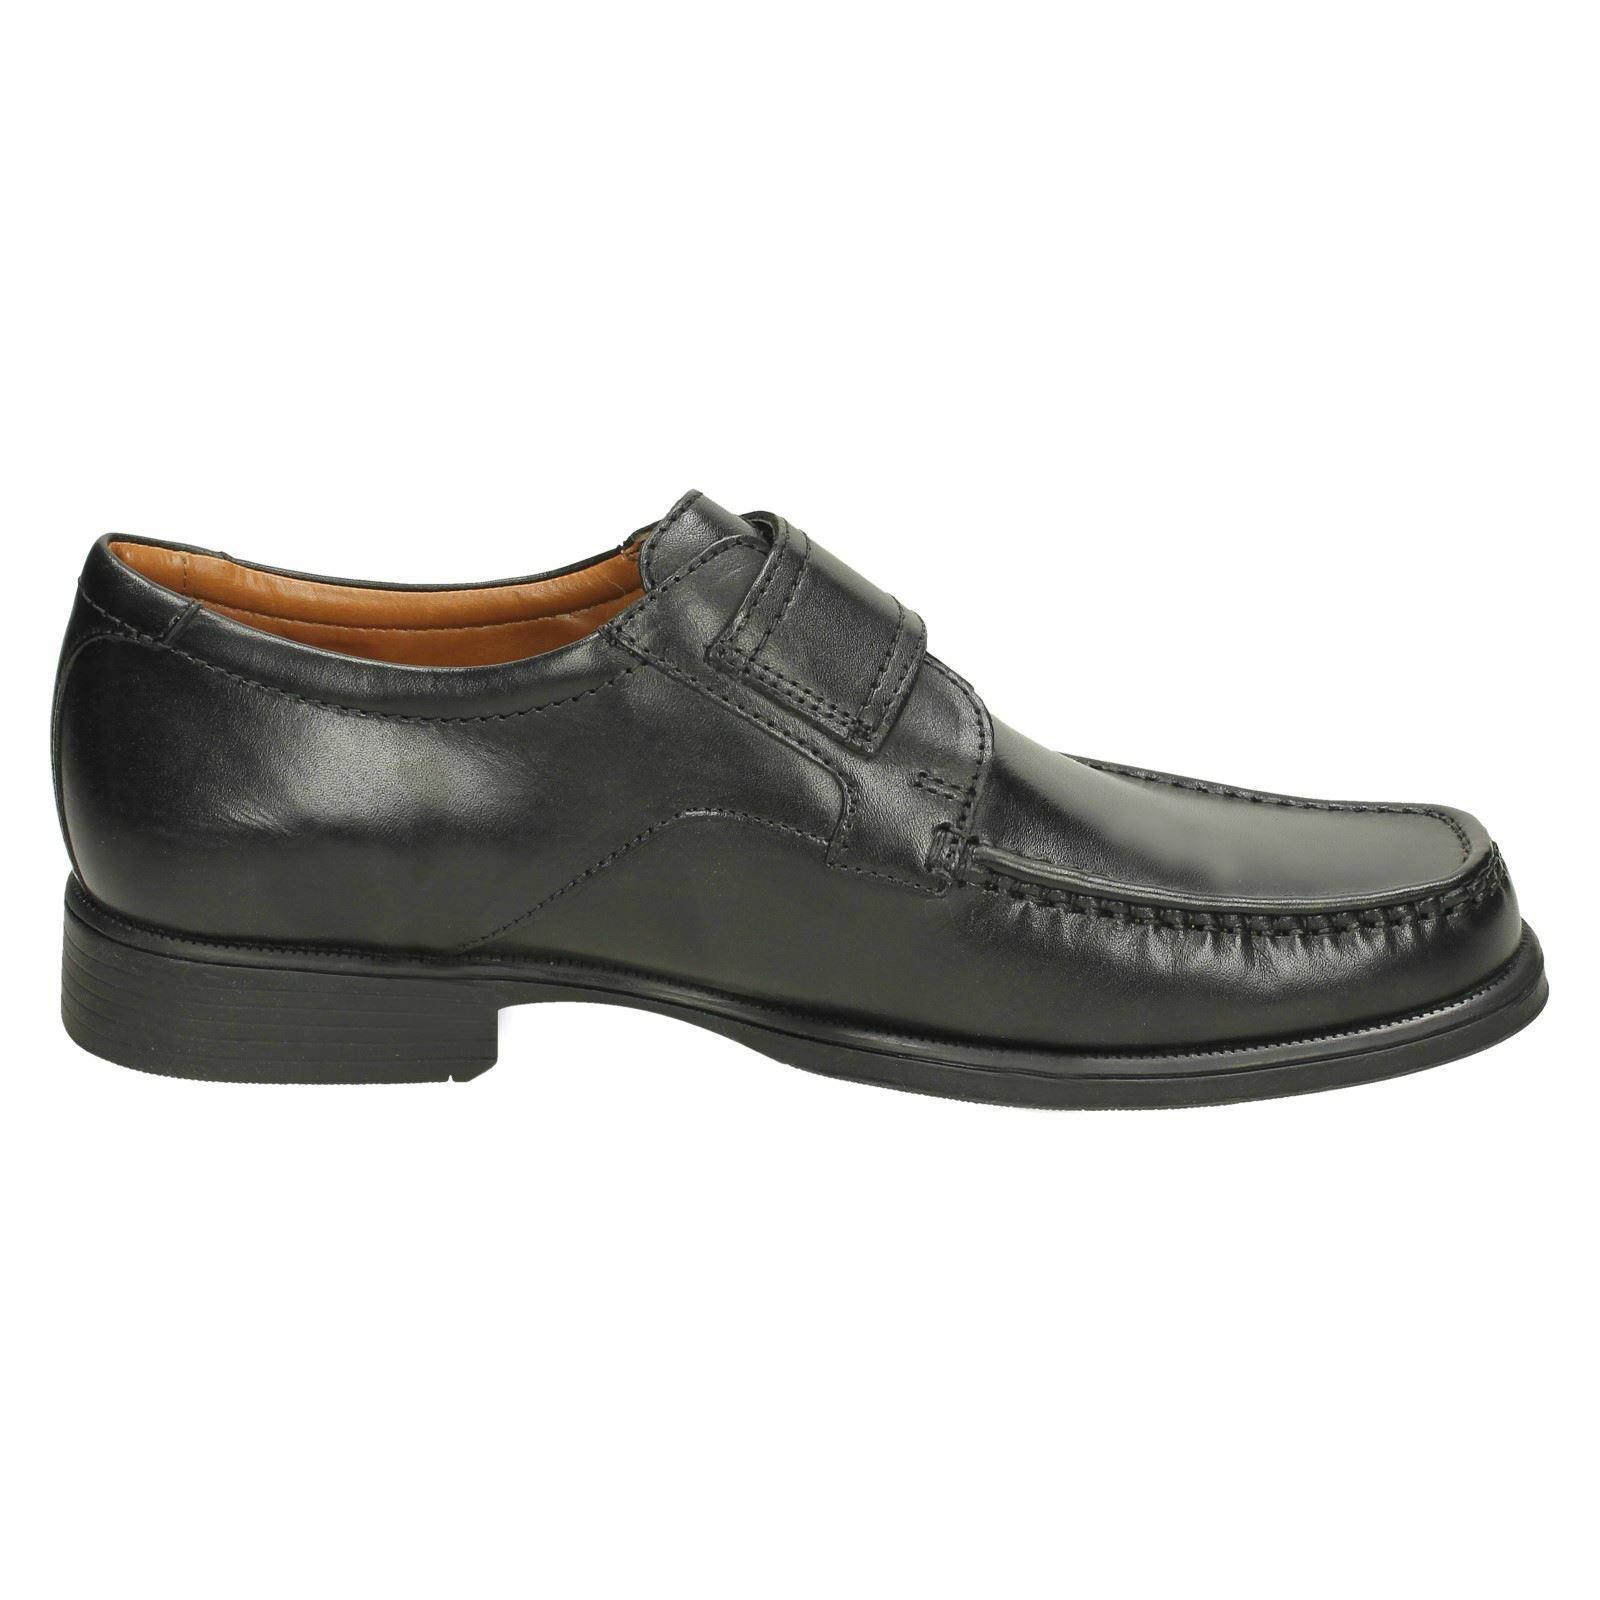 Clarks Mens Huckley Roll Cushion Cell Black Shoe Sizes  G Fitt R22F